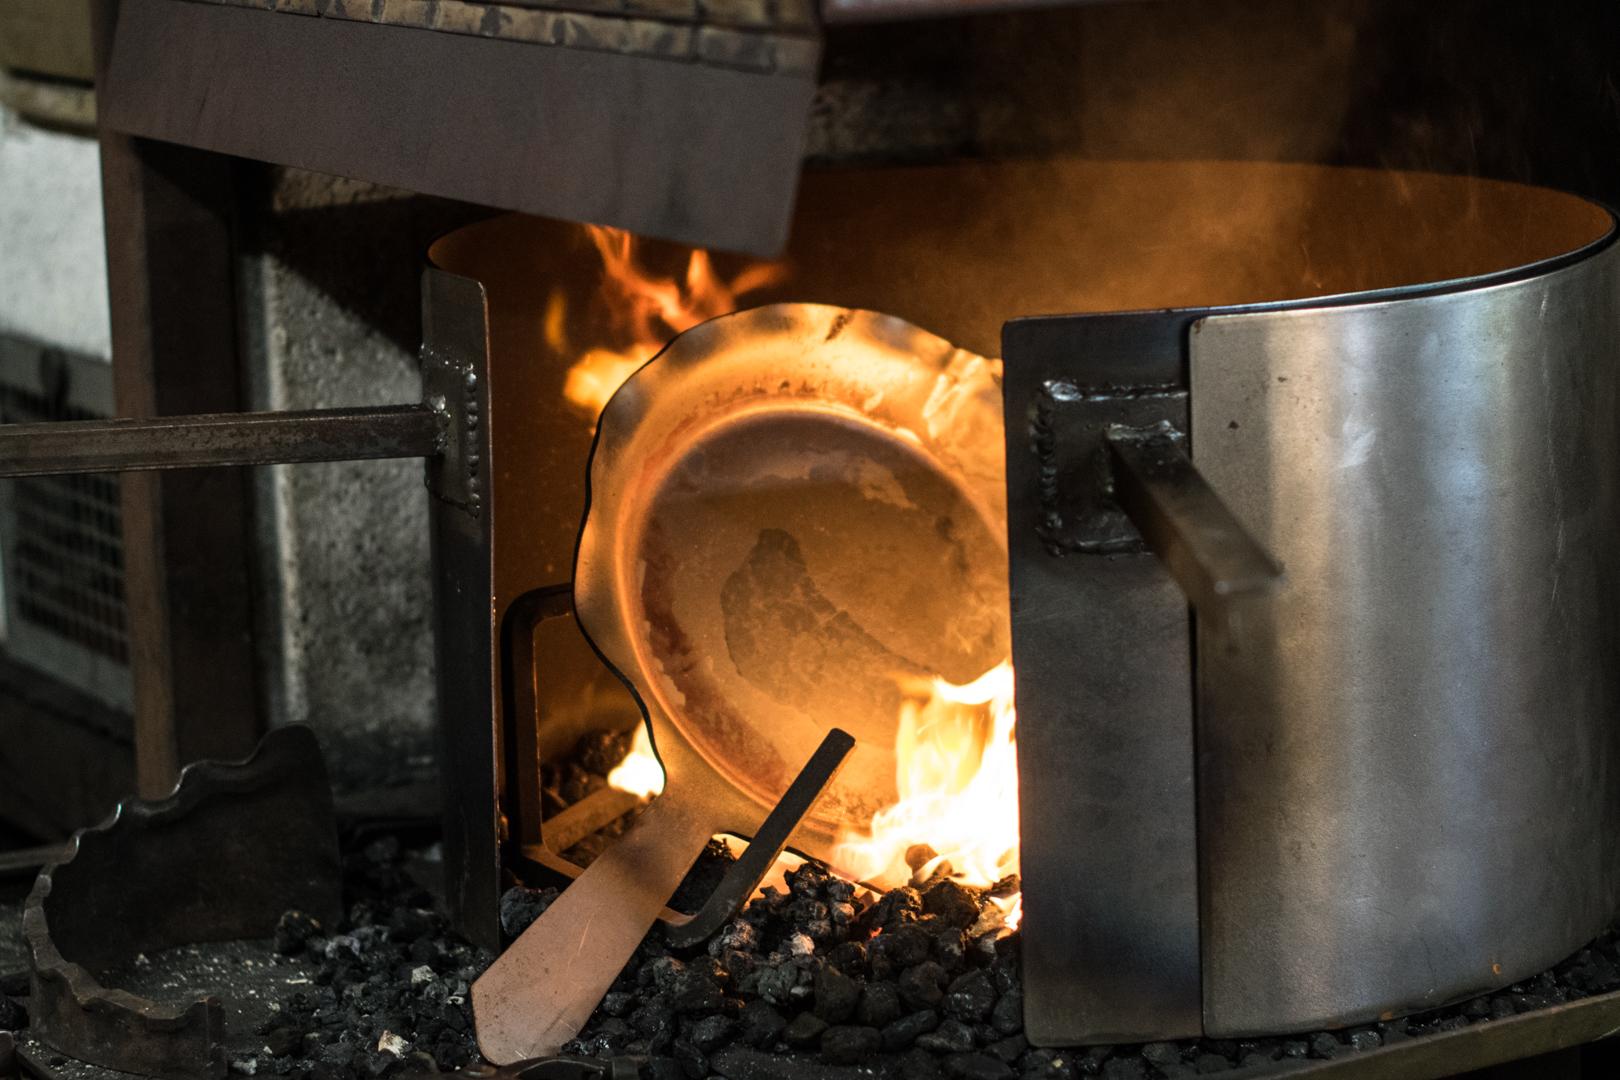 Unfertige Pfanne im Feuer erhitzen.